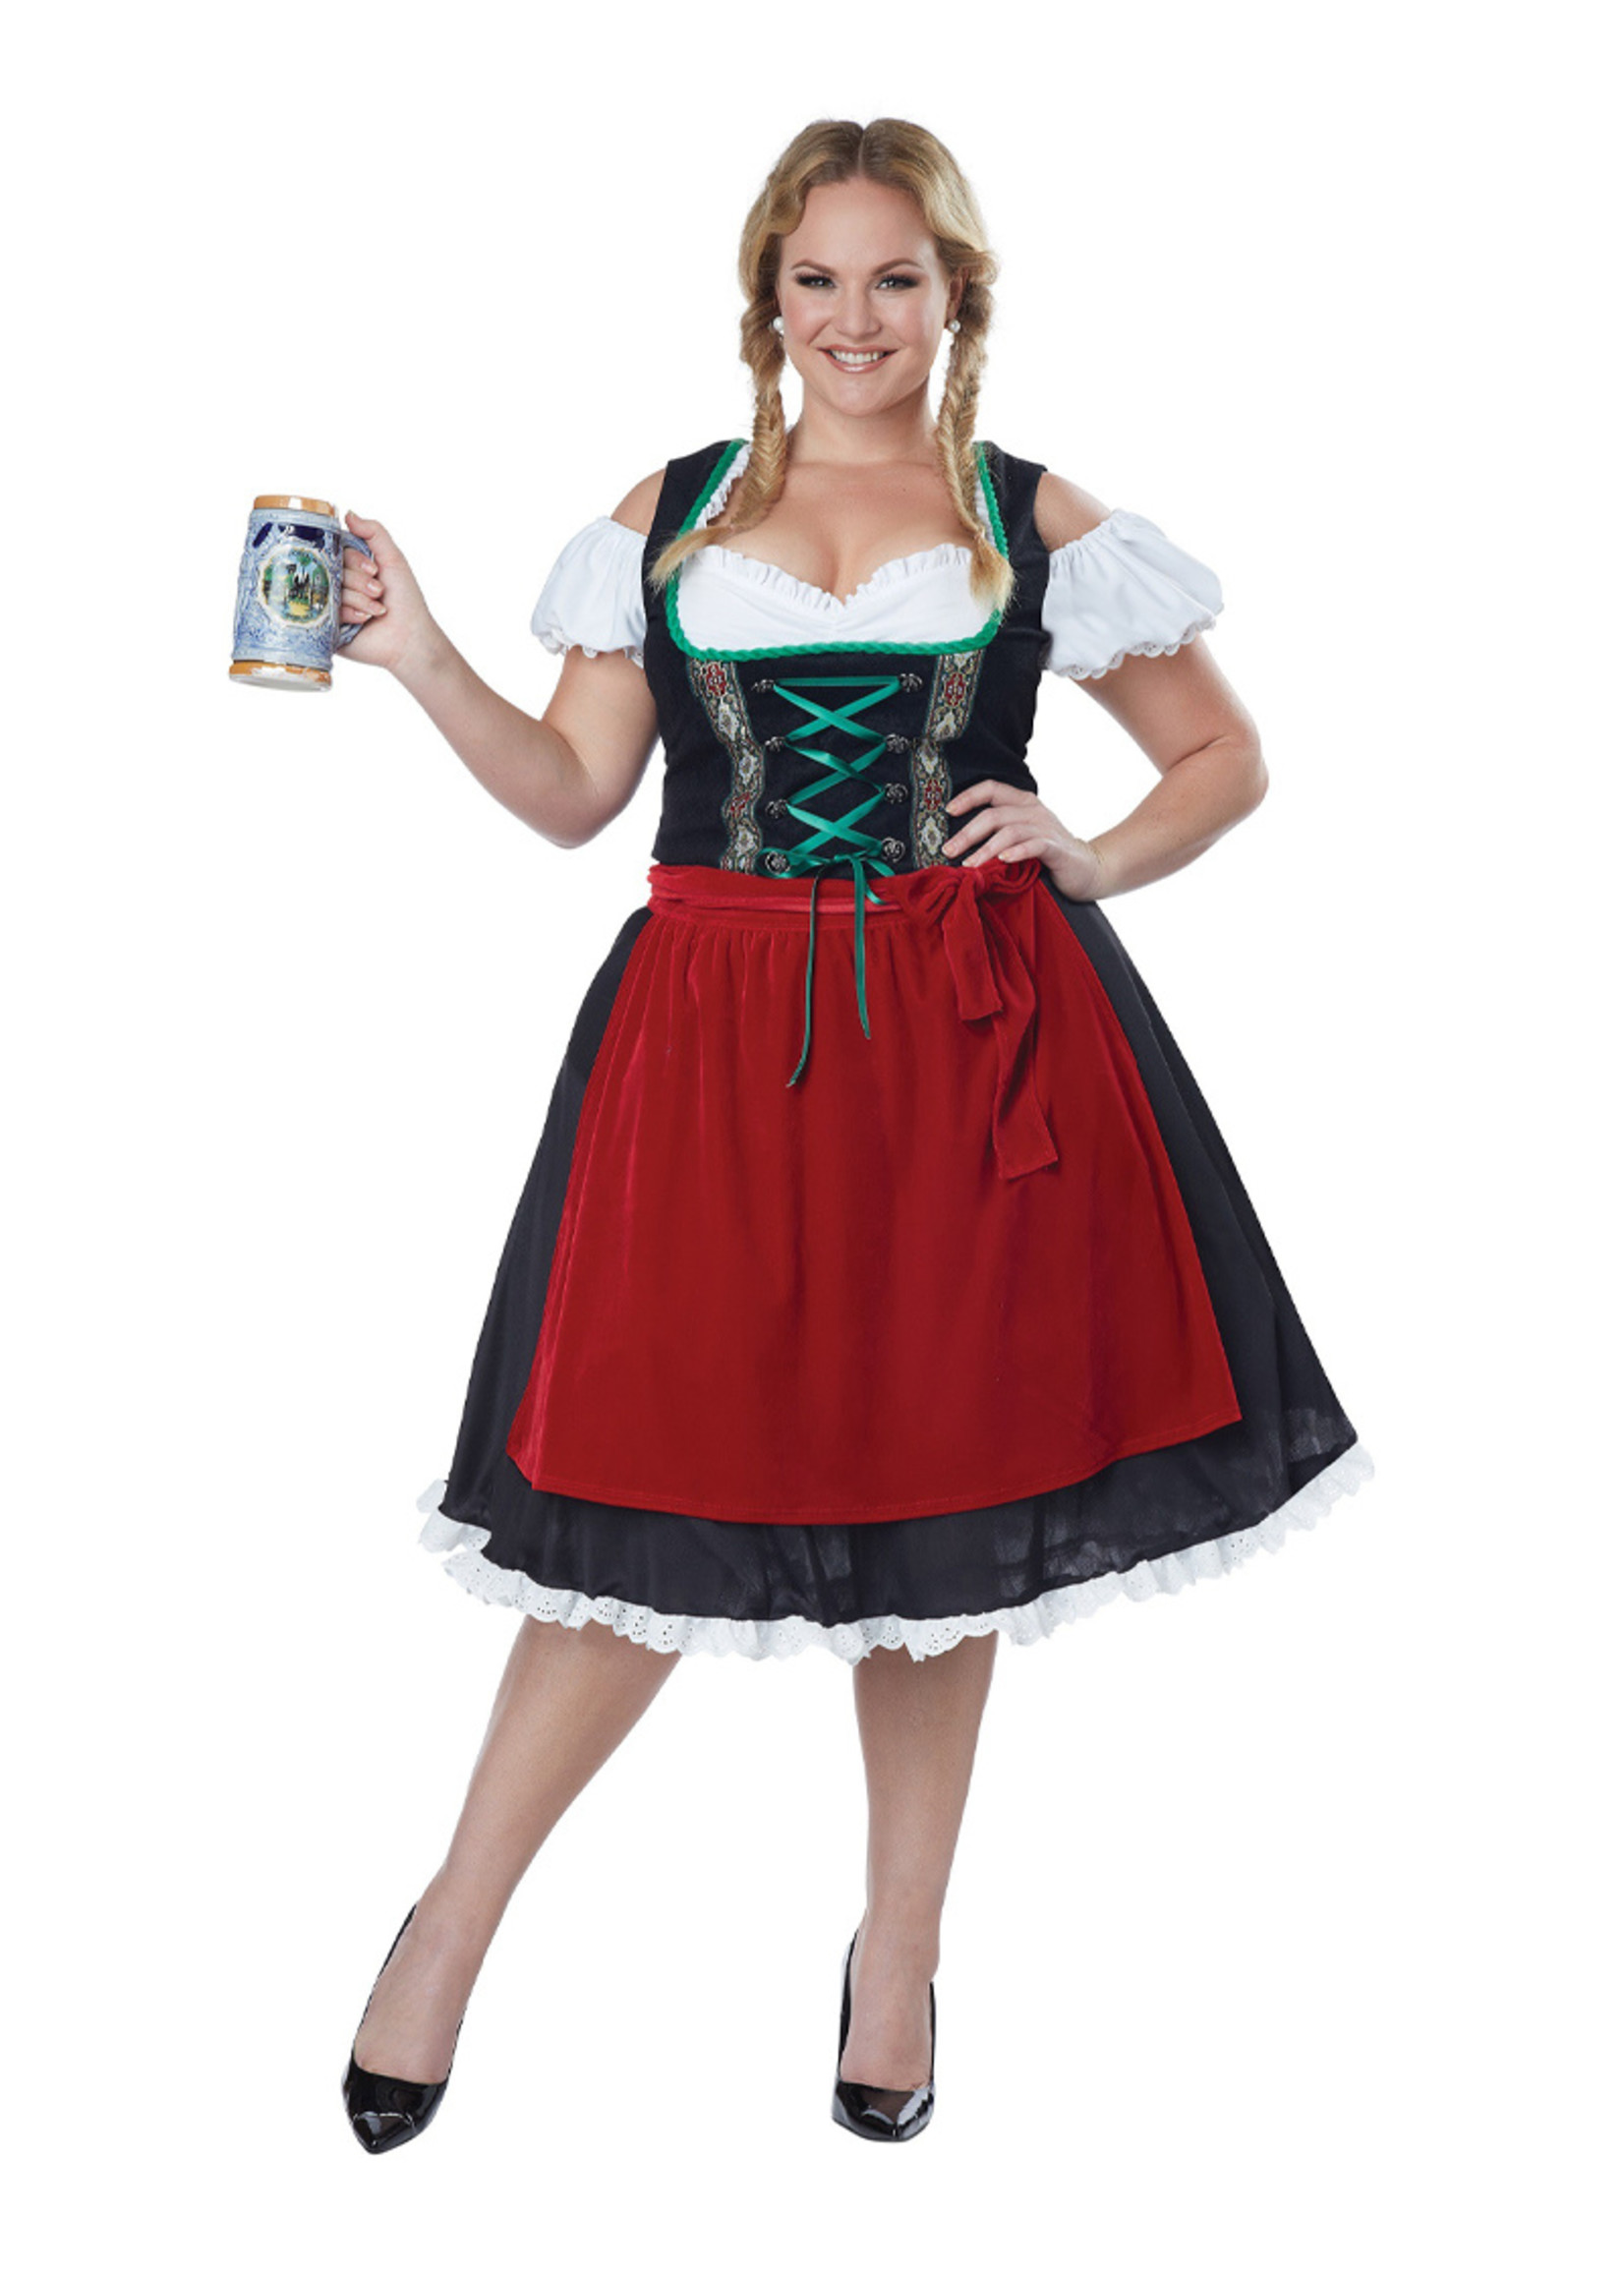 Oktoberfest Frauline Costume - Women's Plus